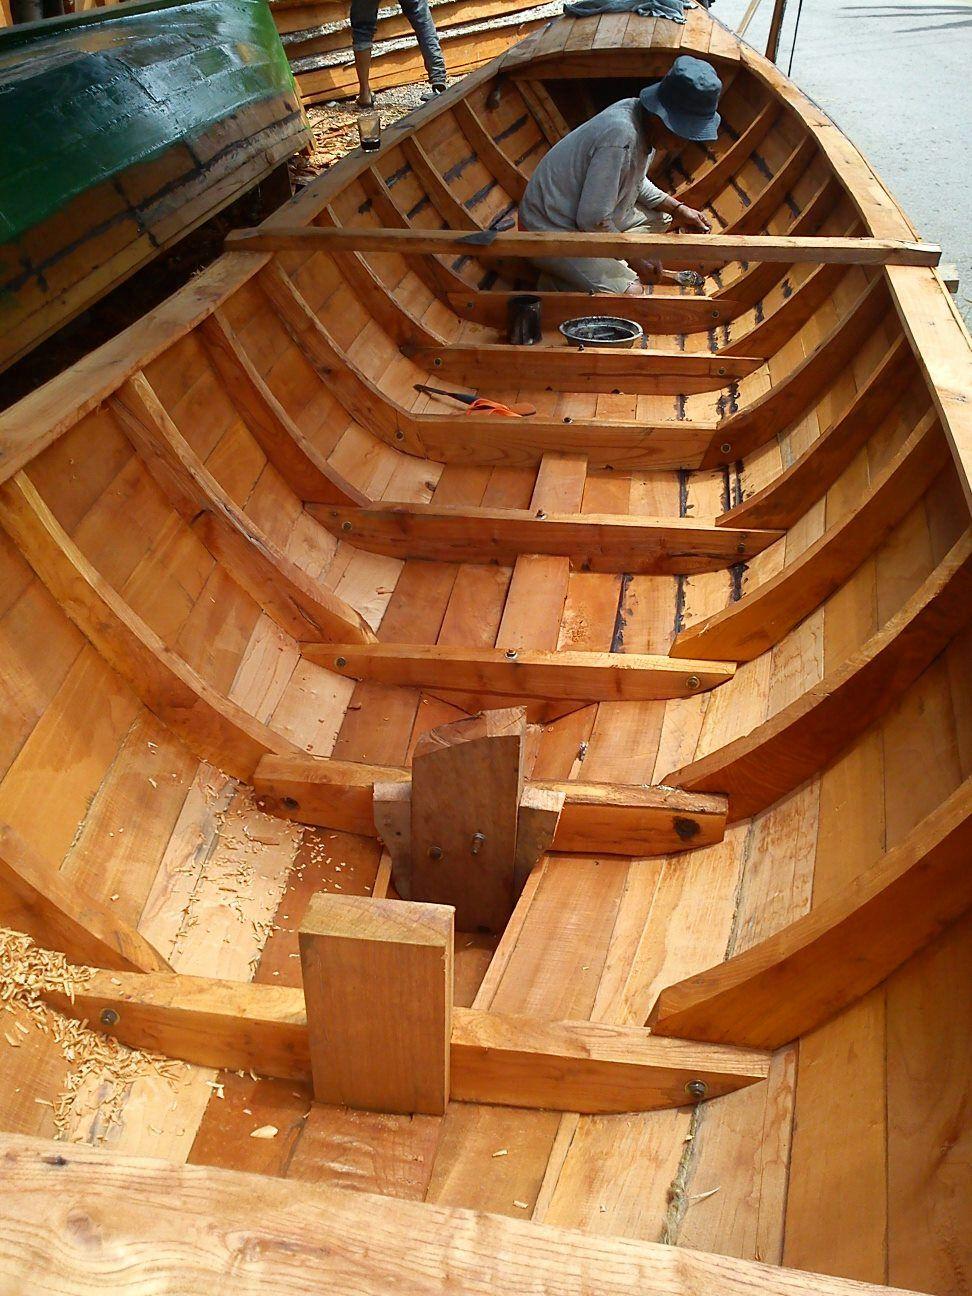 Indonesian Traditional Wooden Boats Barcos De Madera Maquetas De Barcos Barcos